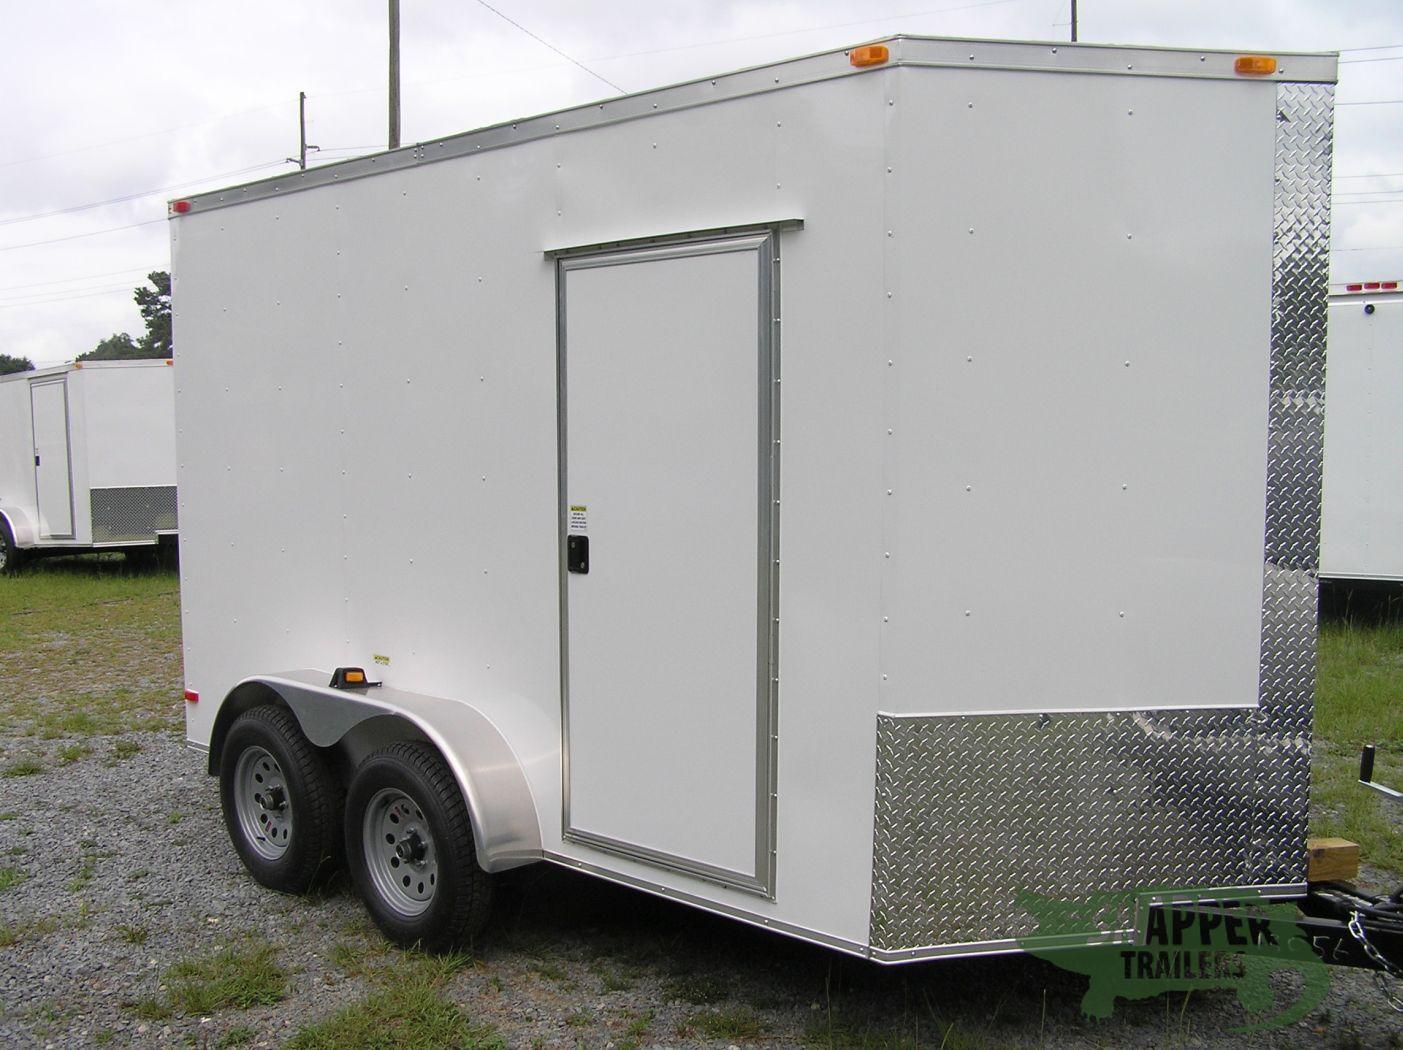 Camper trailer height wonderful purple camper trailer for Rv height